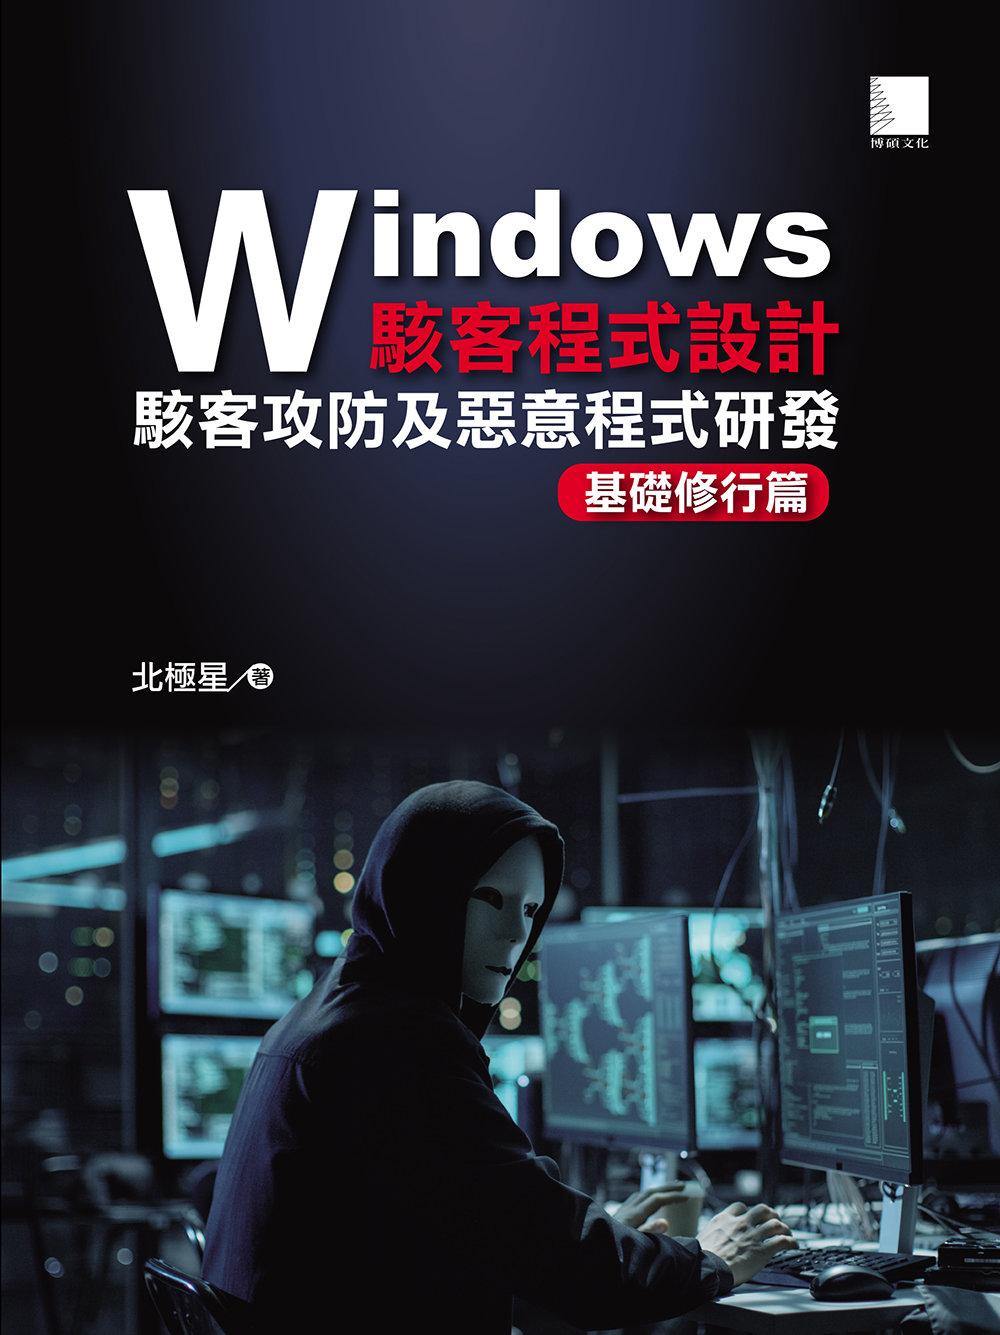 Windows 駭客程式設計:駭客攻防及惡意程式研發 (基礎修行篇)-preview-1